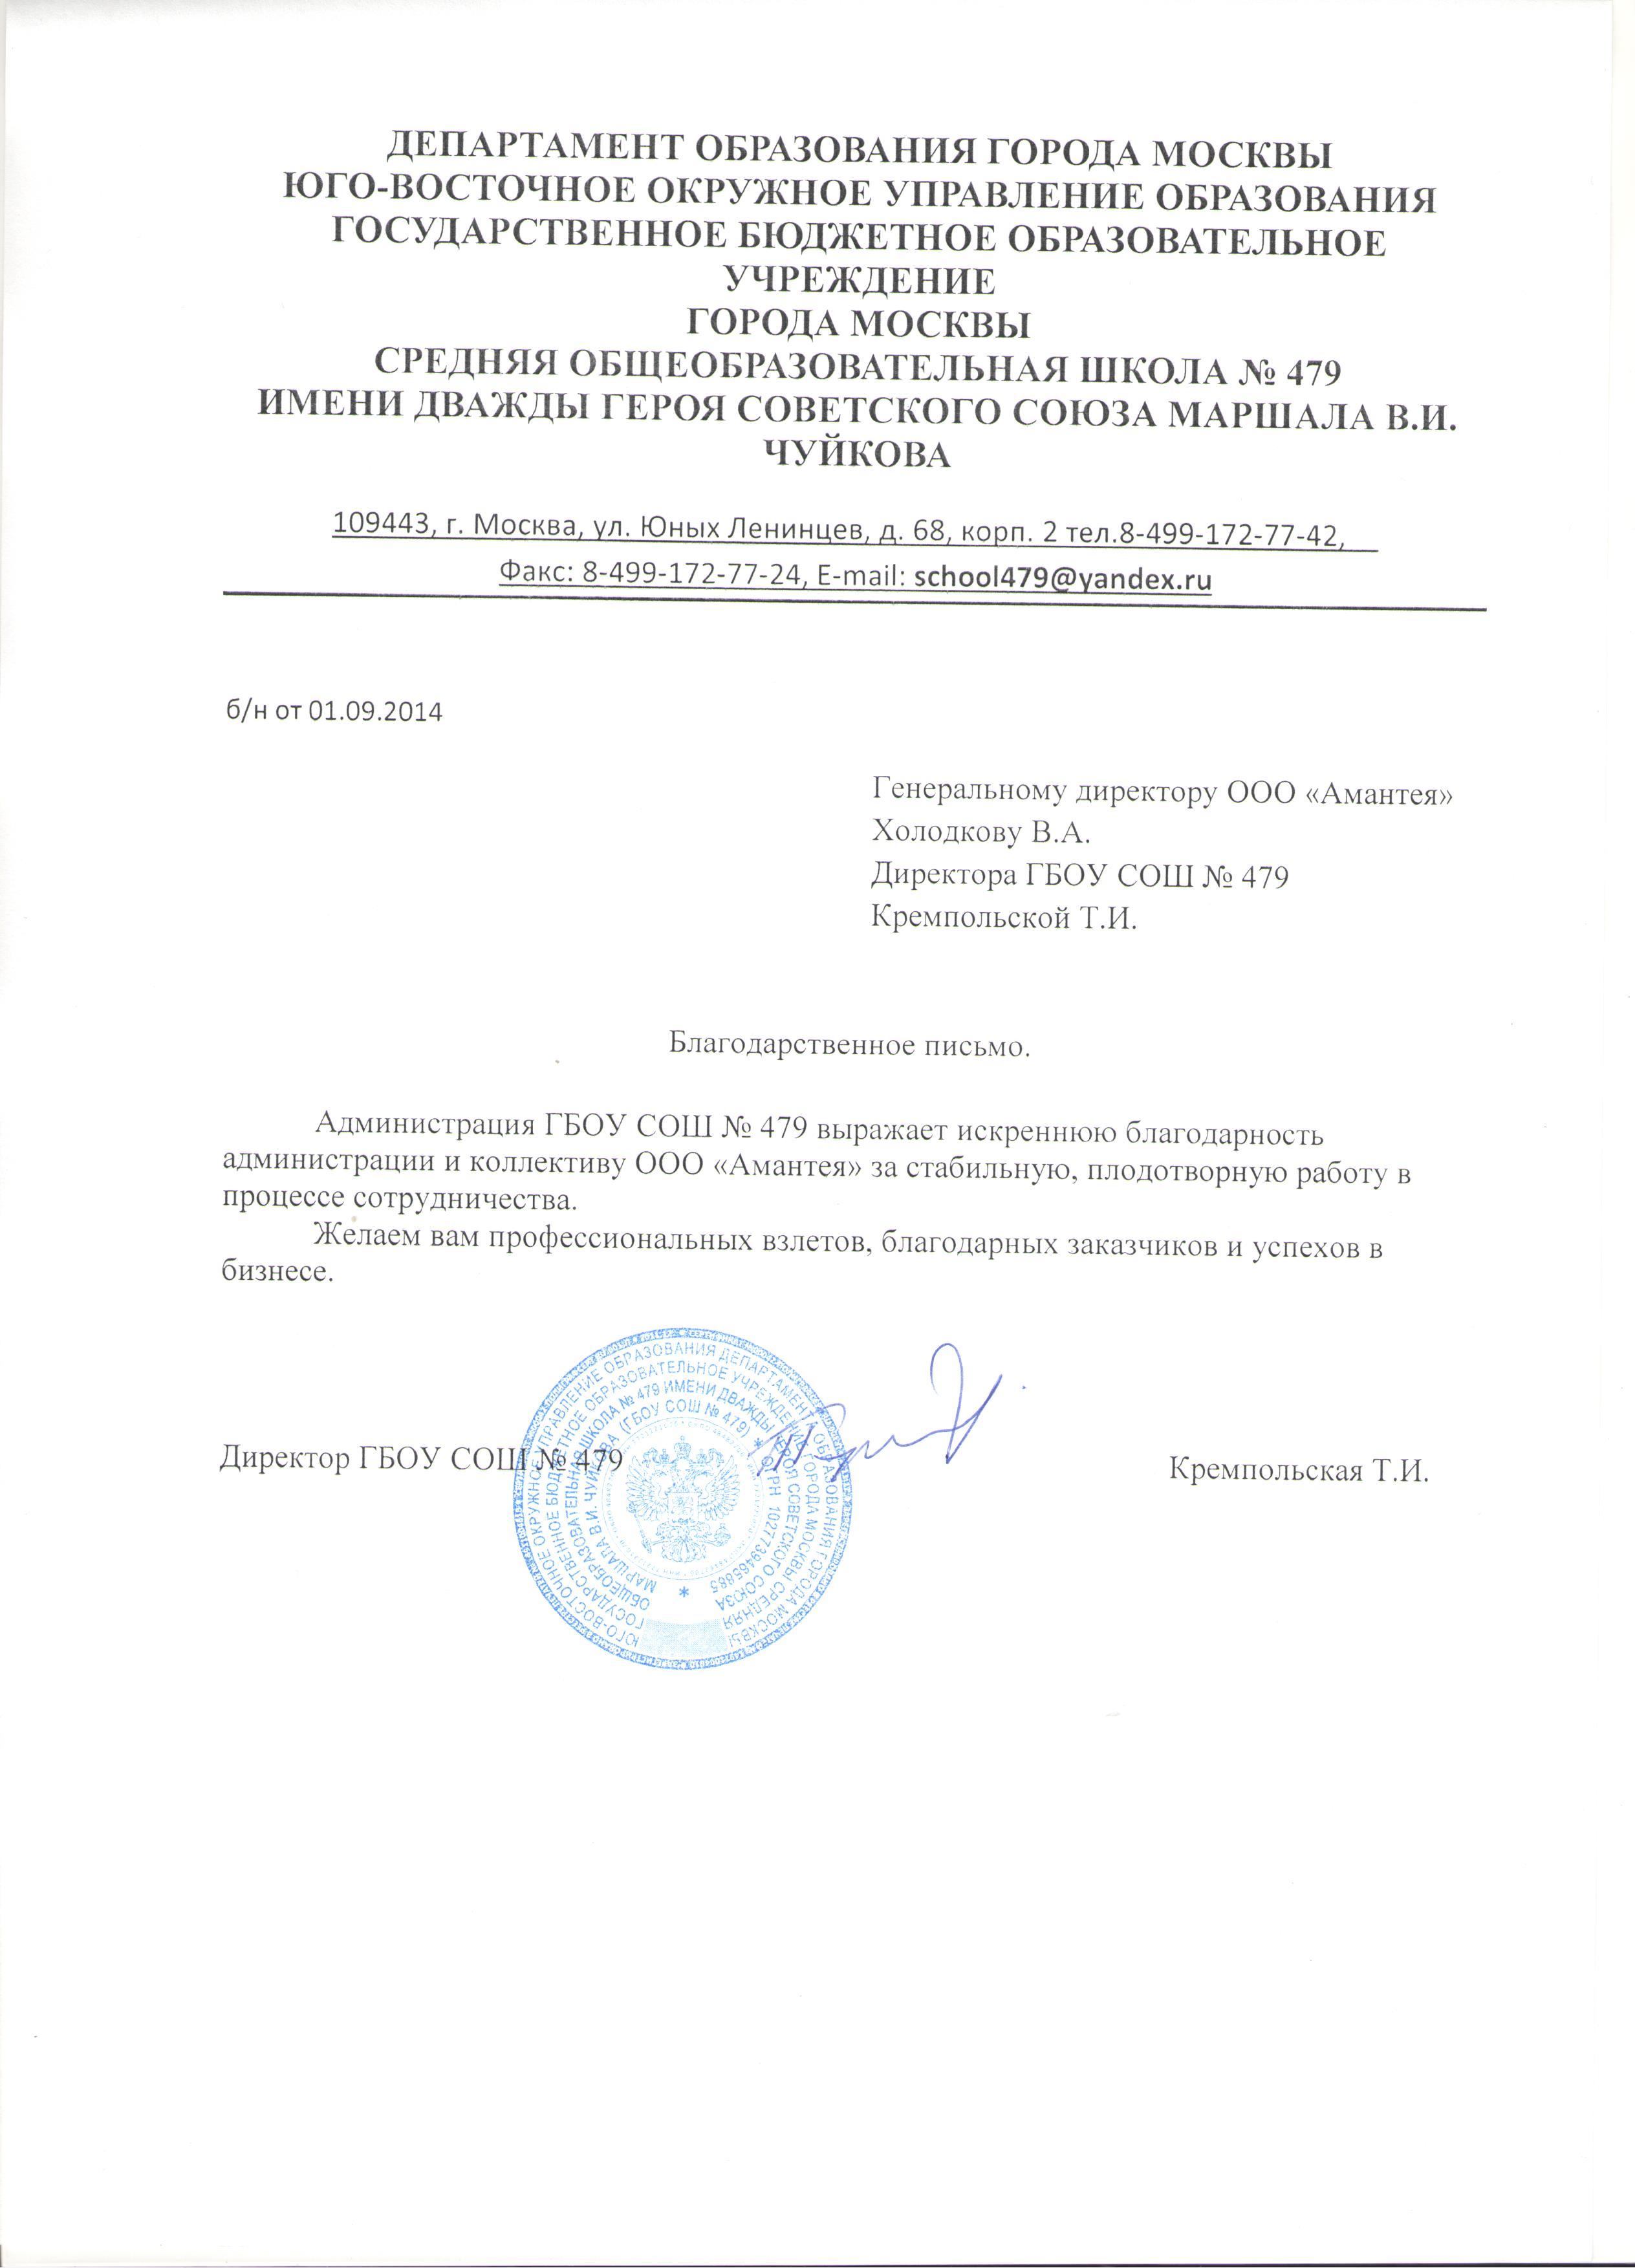 ГБОУ СОШ №479